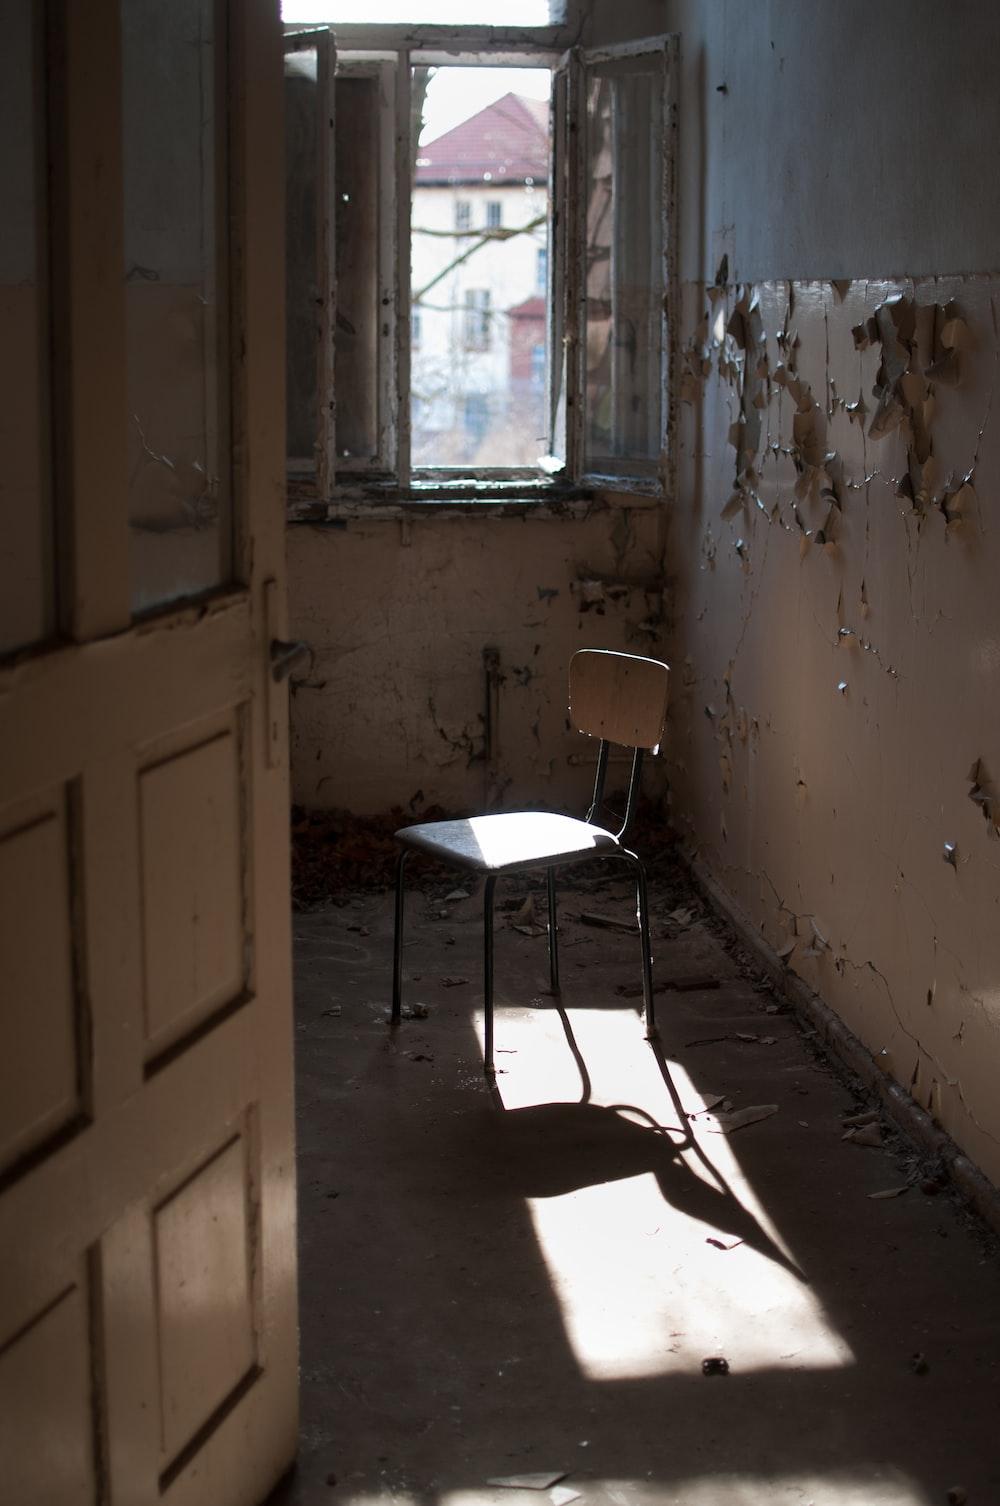 empty brown steel chair